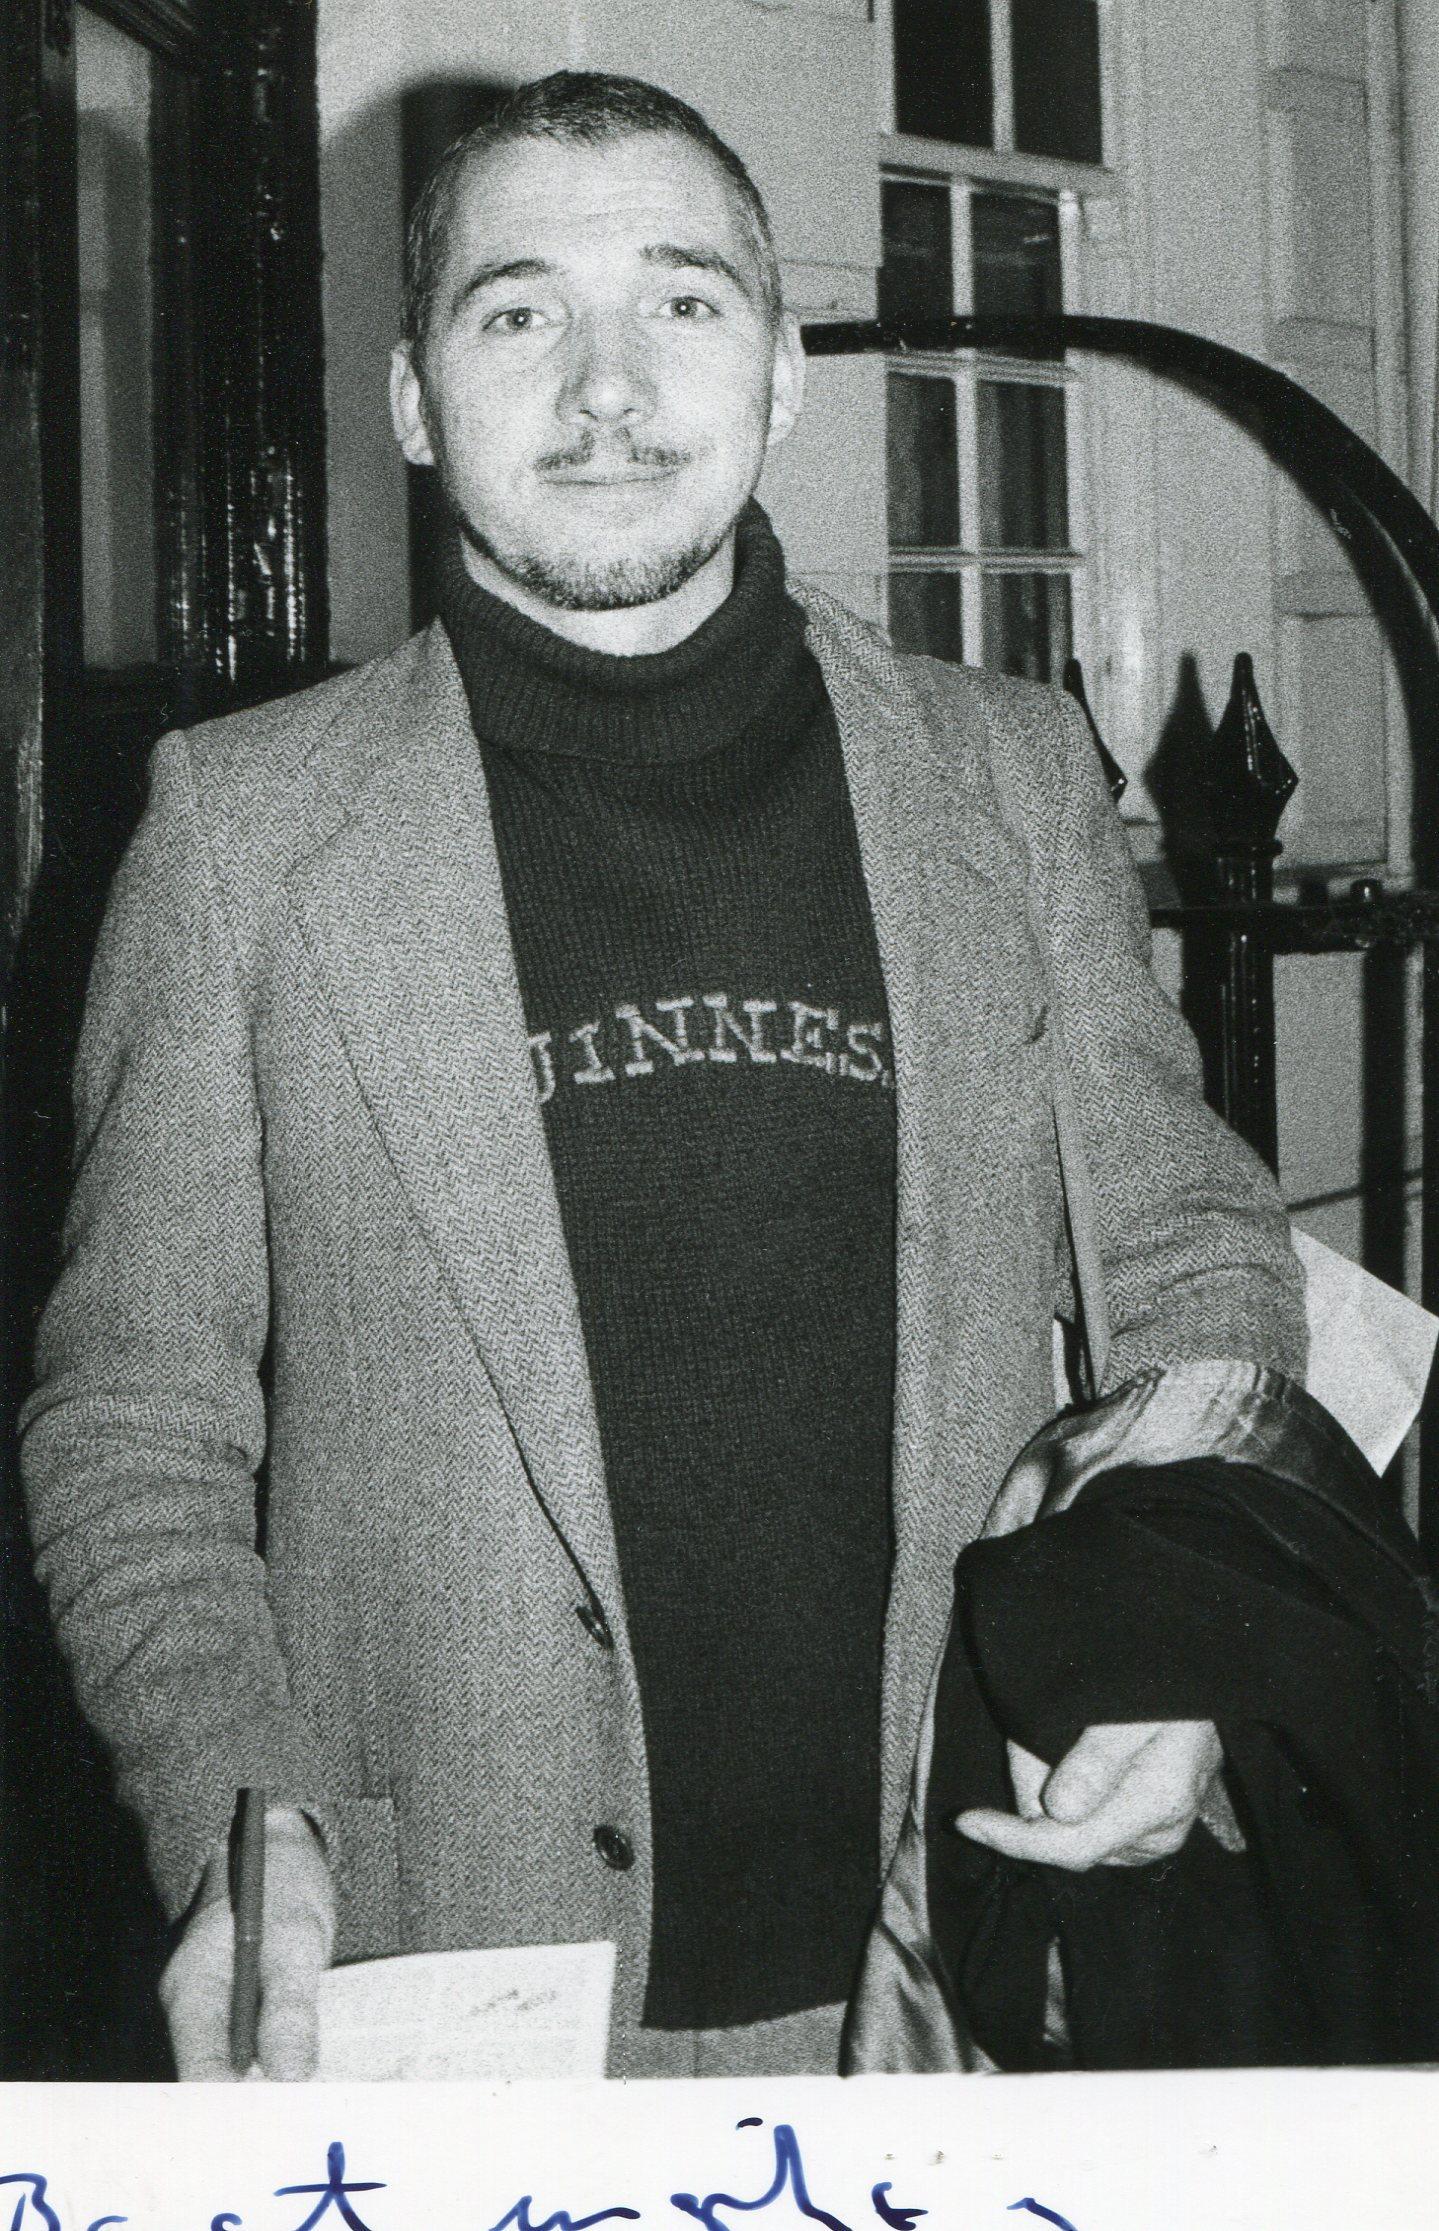 Frank Grimes